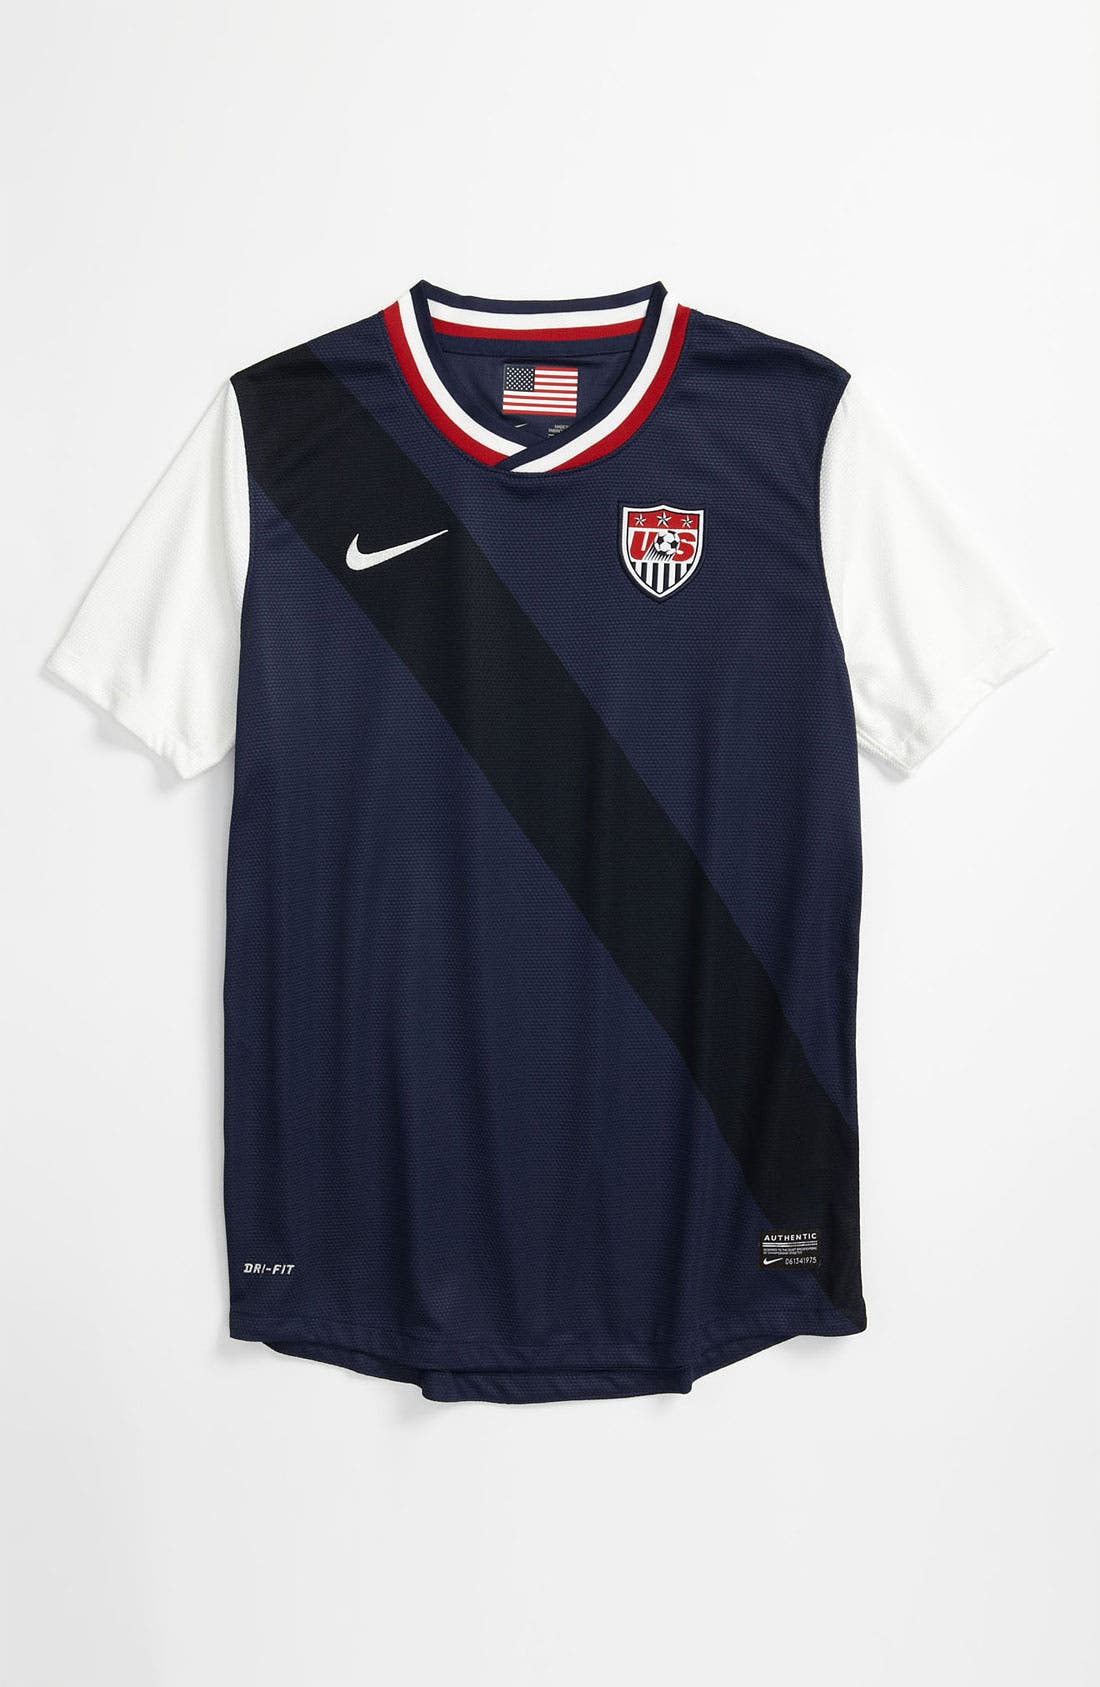 Alternate Image 1 Selected - Nike 'USA Away' Dri-FIT Jersey (Big Boys)